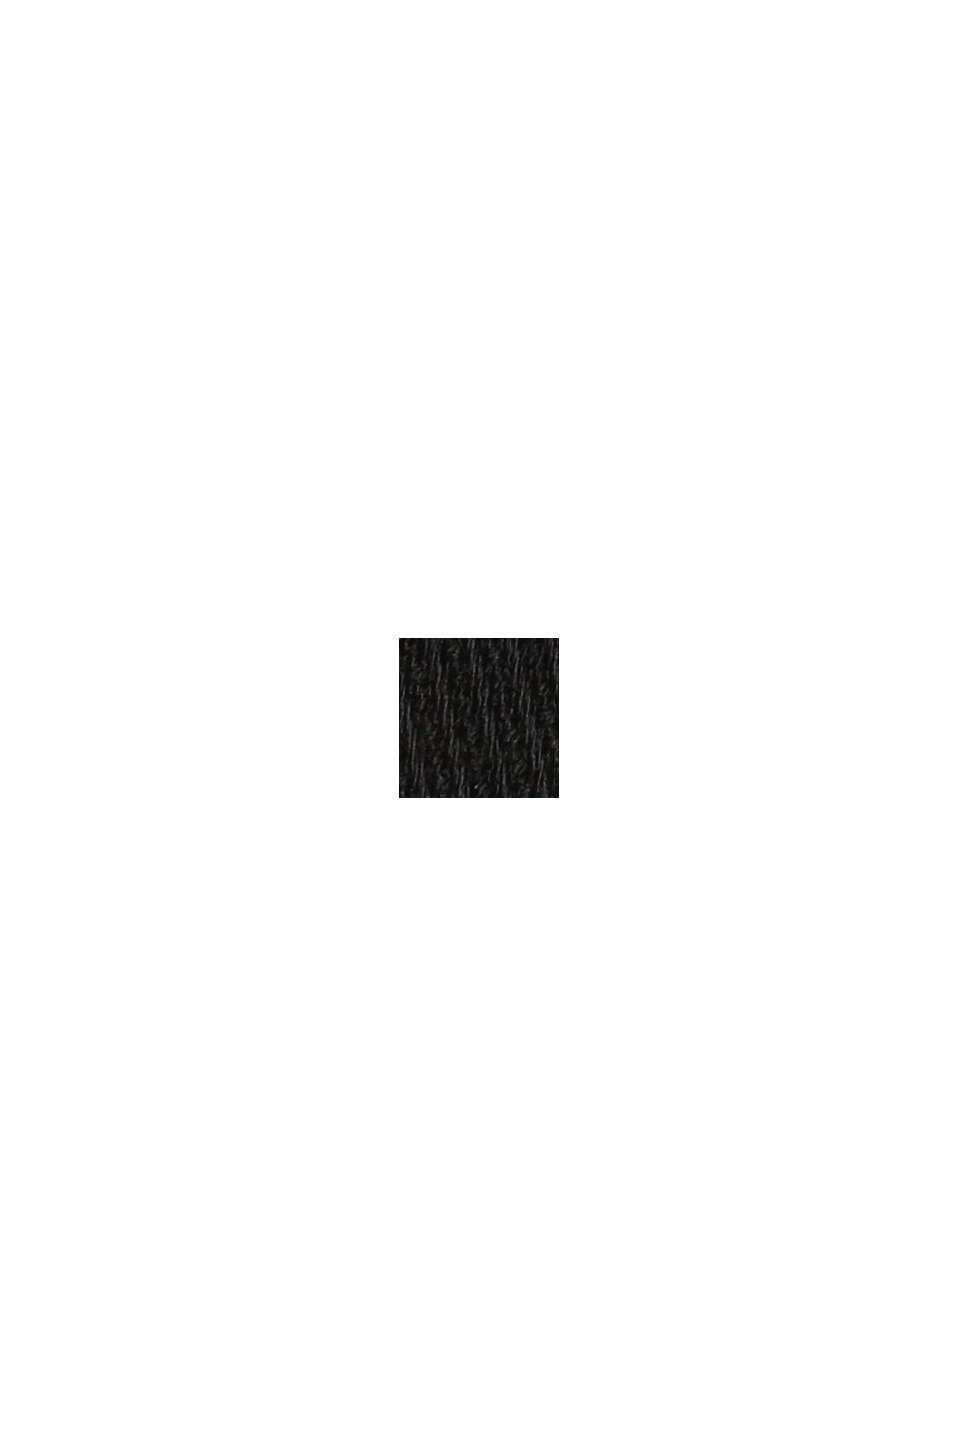 TWILL Mix + Match High-rise-Hose, BLACK, swatch